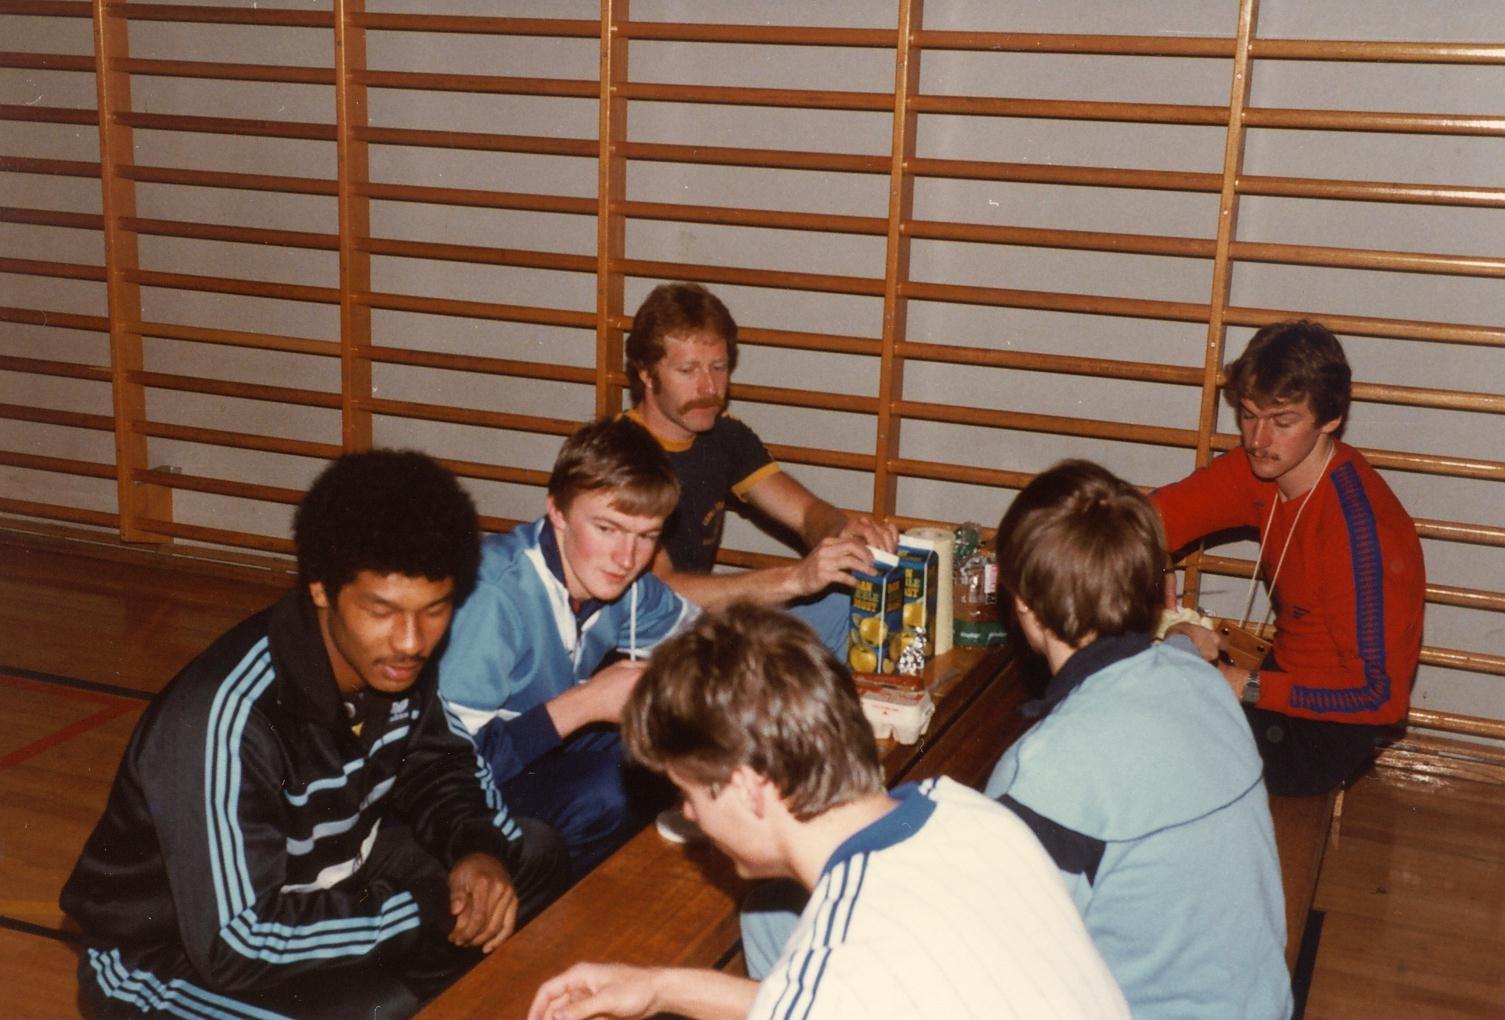 Scan11177 EKEBERG CUO 21-23-5 1983